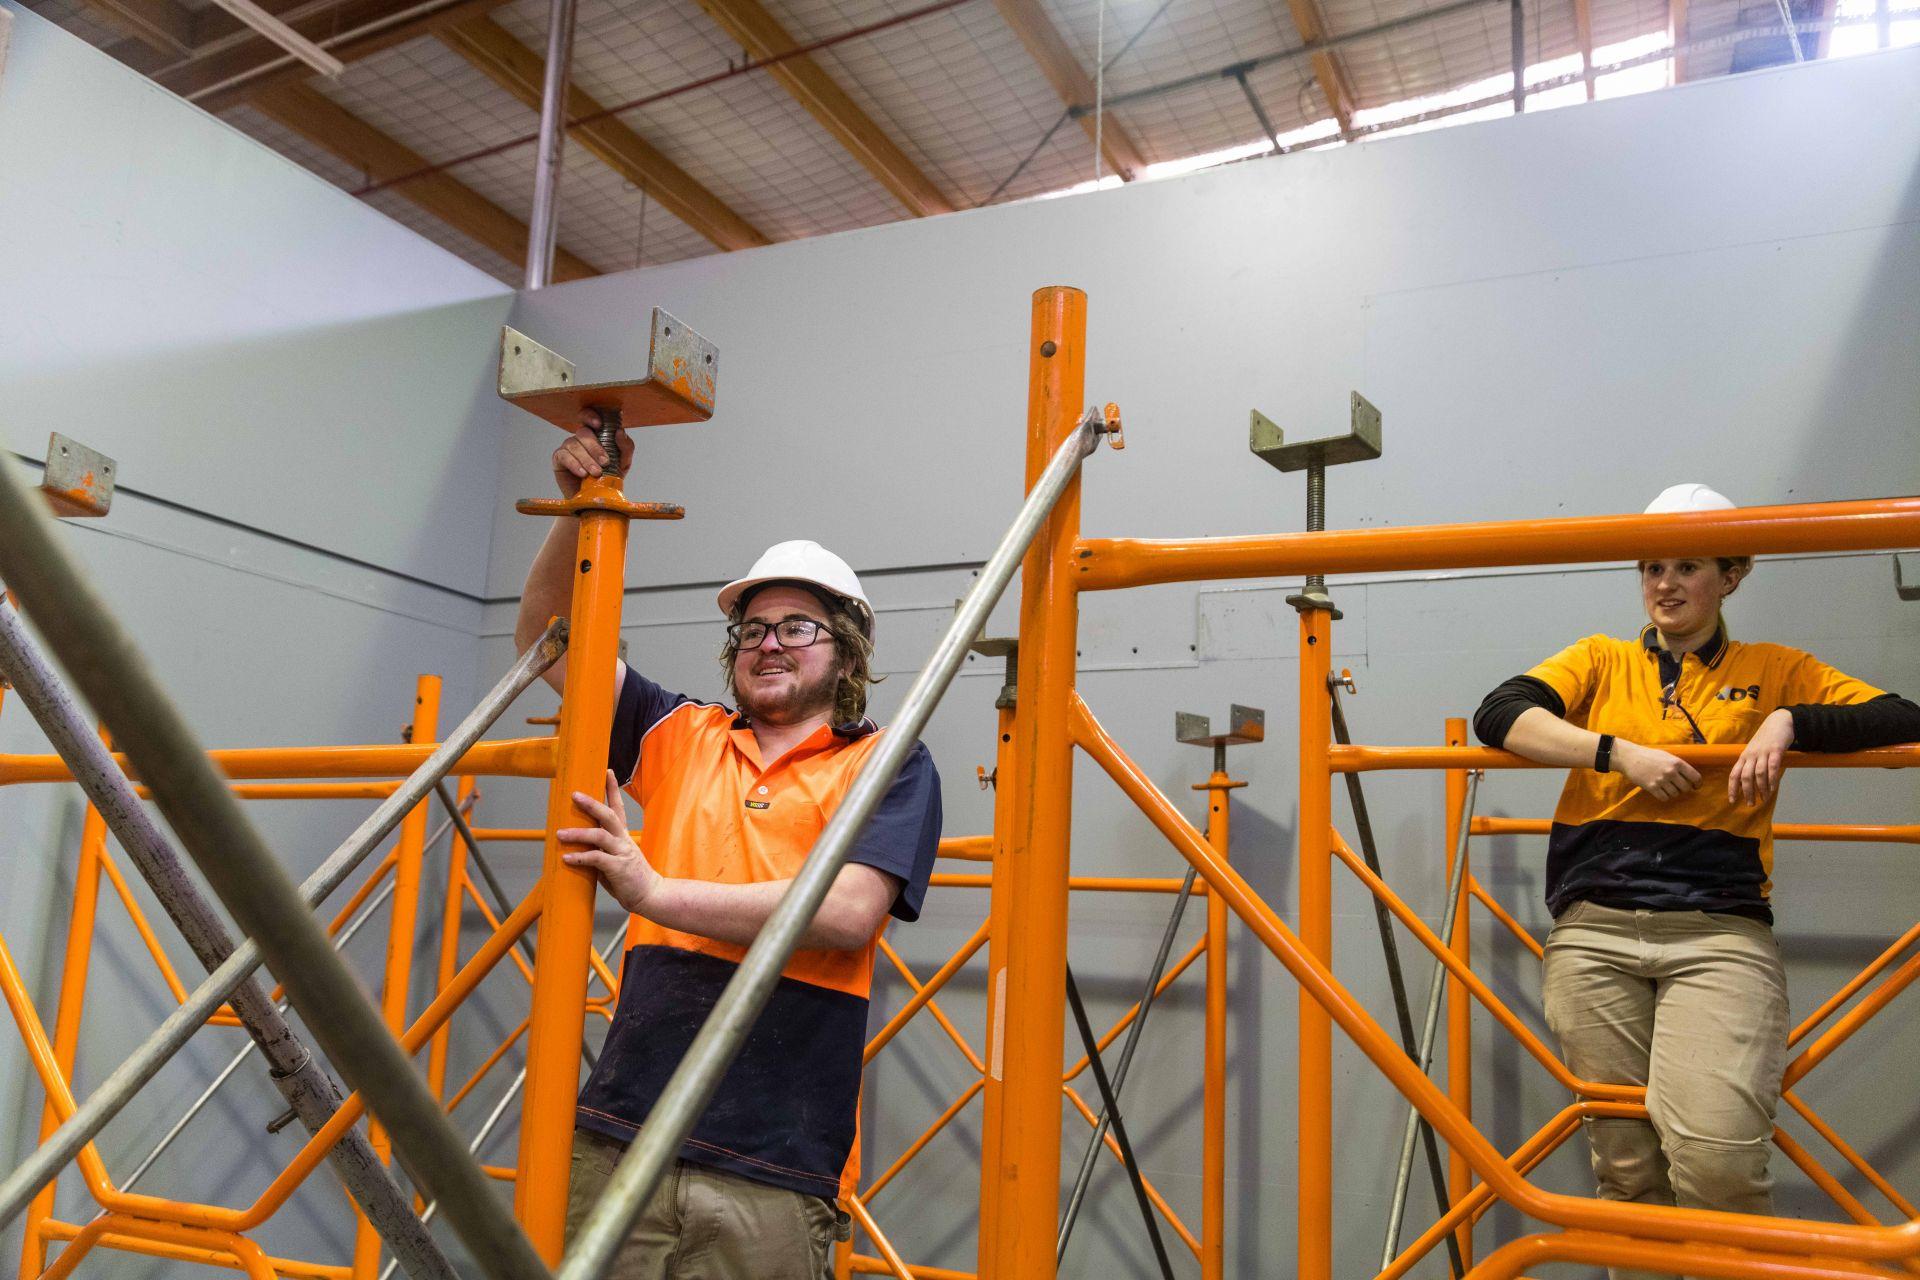 TasTAFE students putting together scaffolding